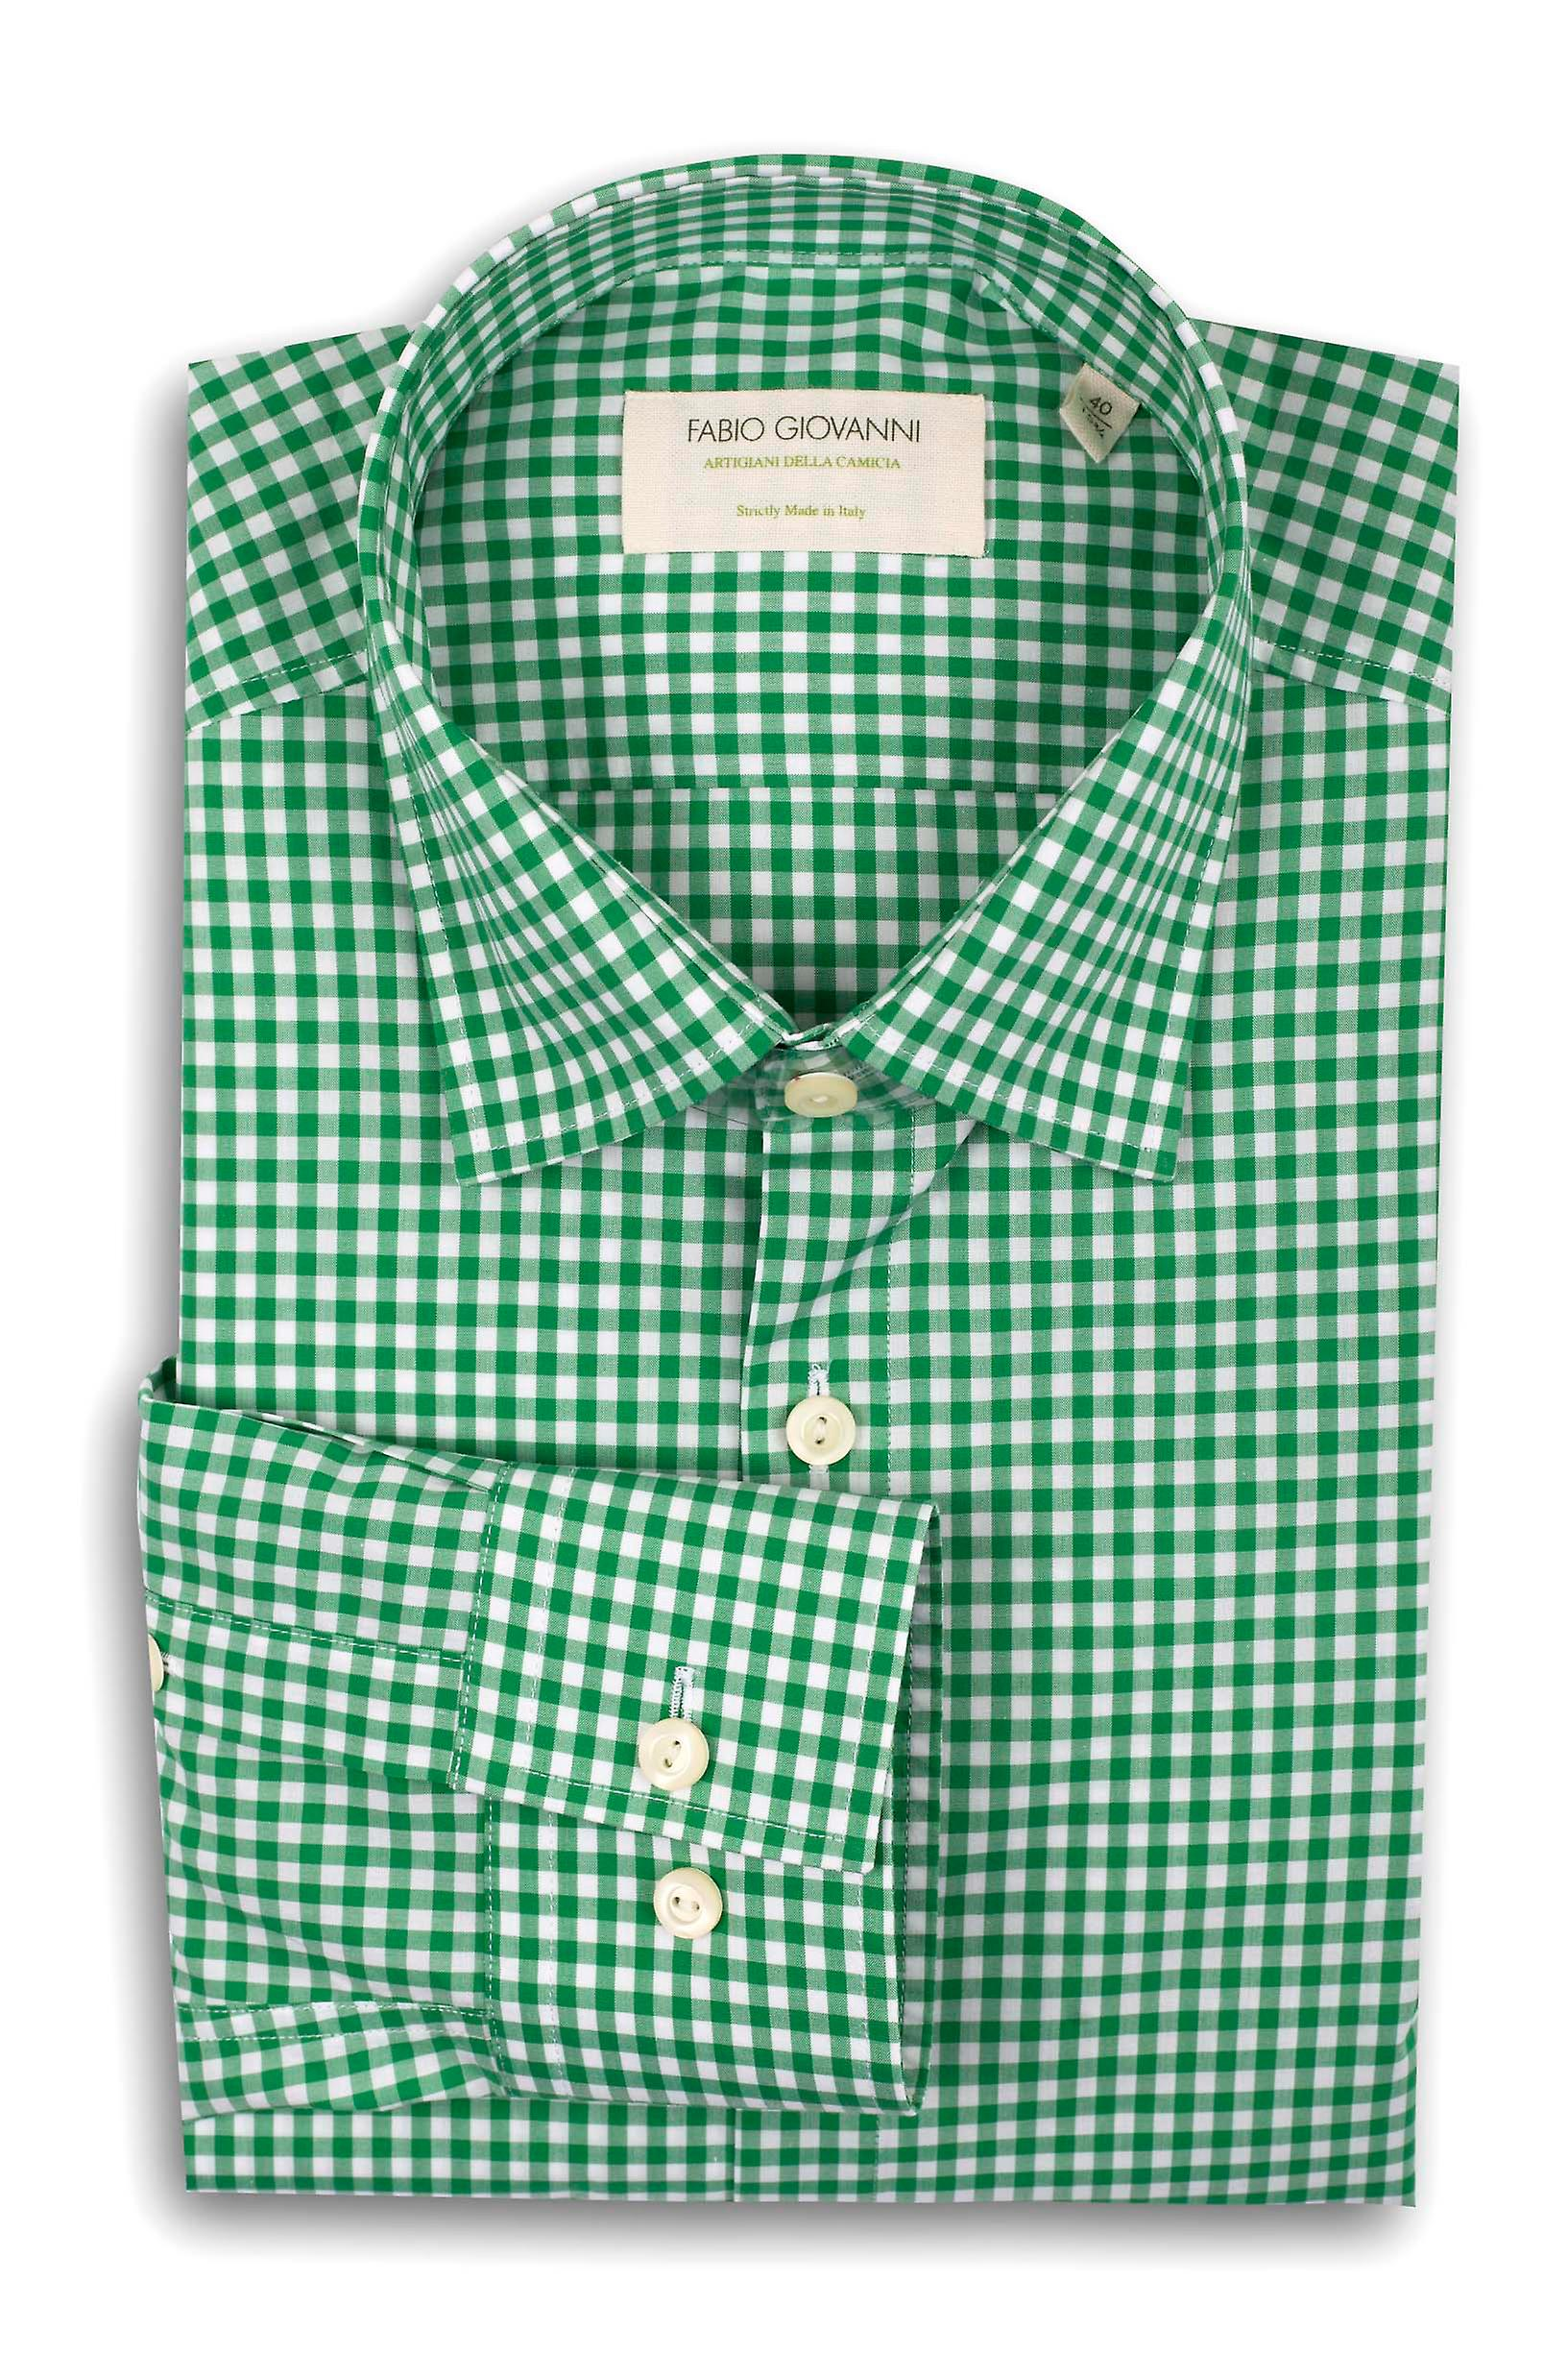 Fabio Giovanni Avellino Shirt - Italian Poplin Cotton Refined Green Gingham Check Shirt